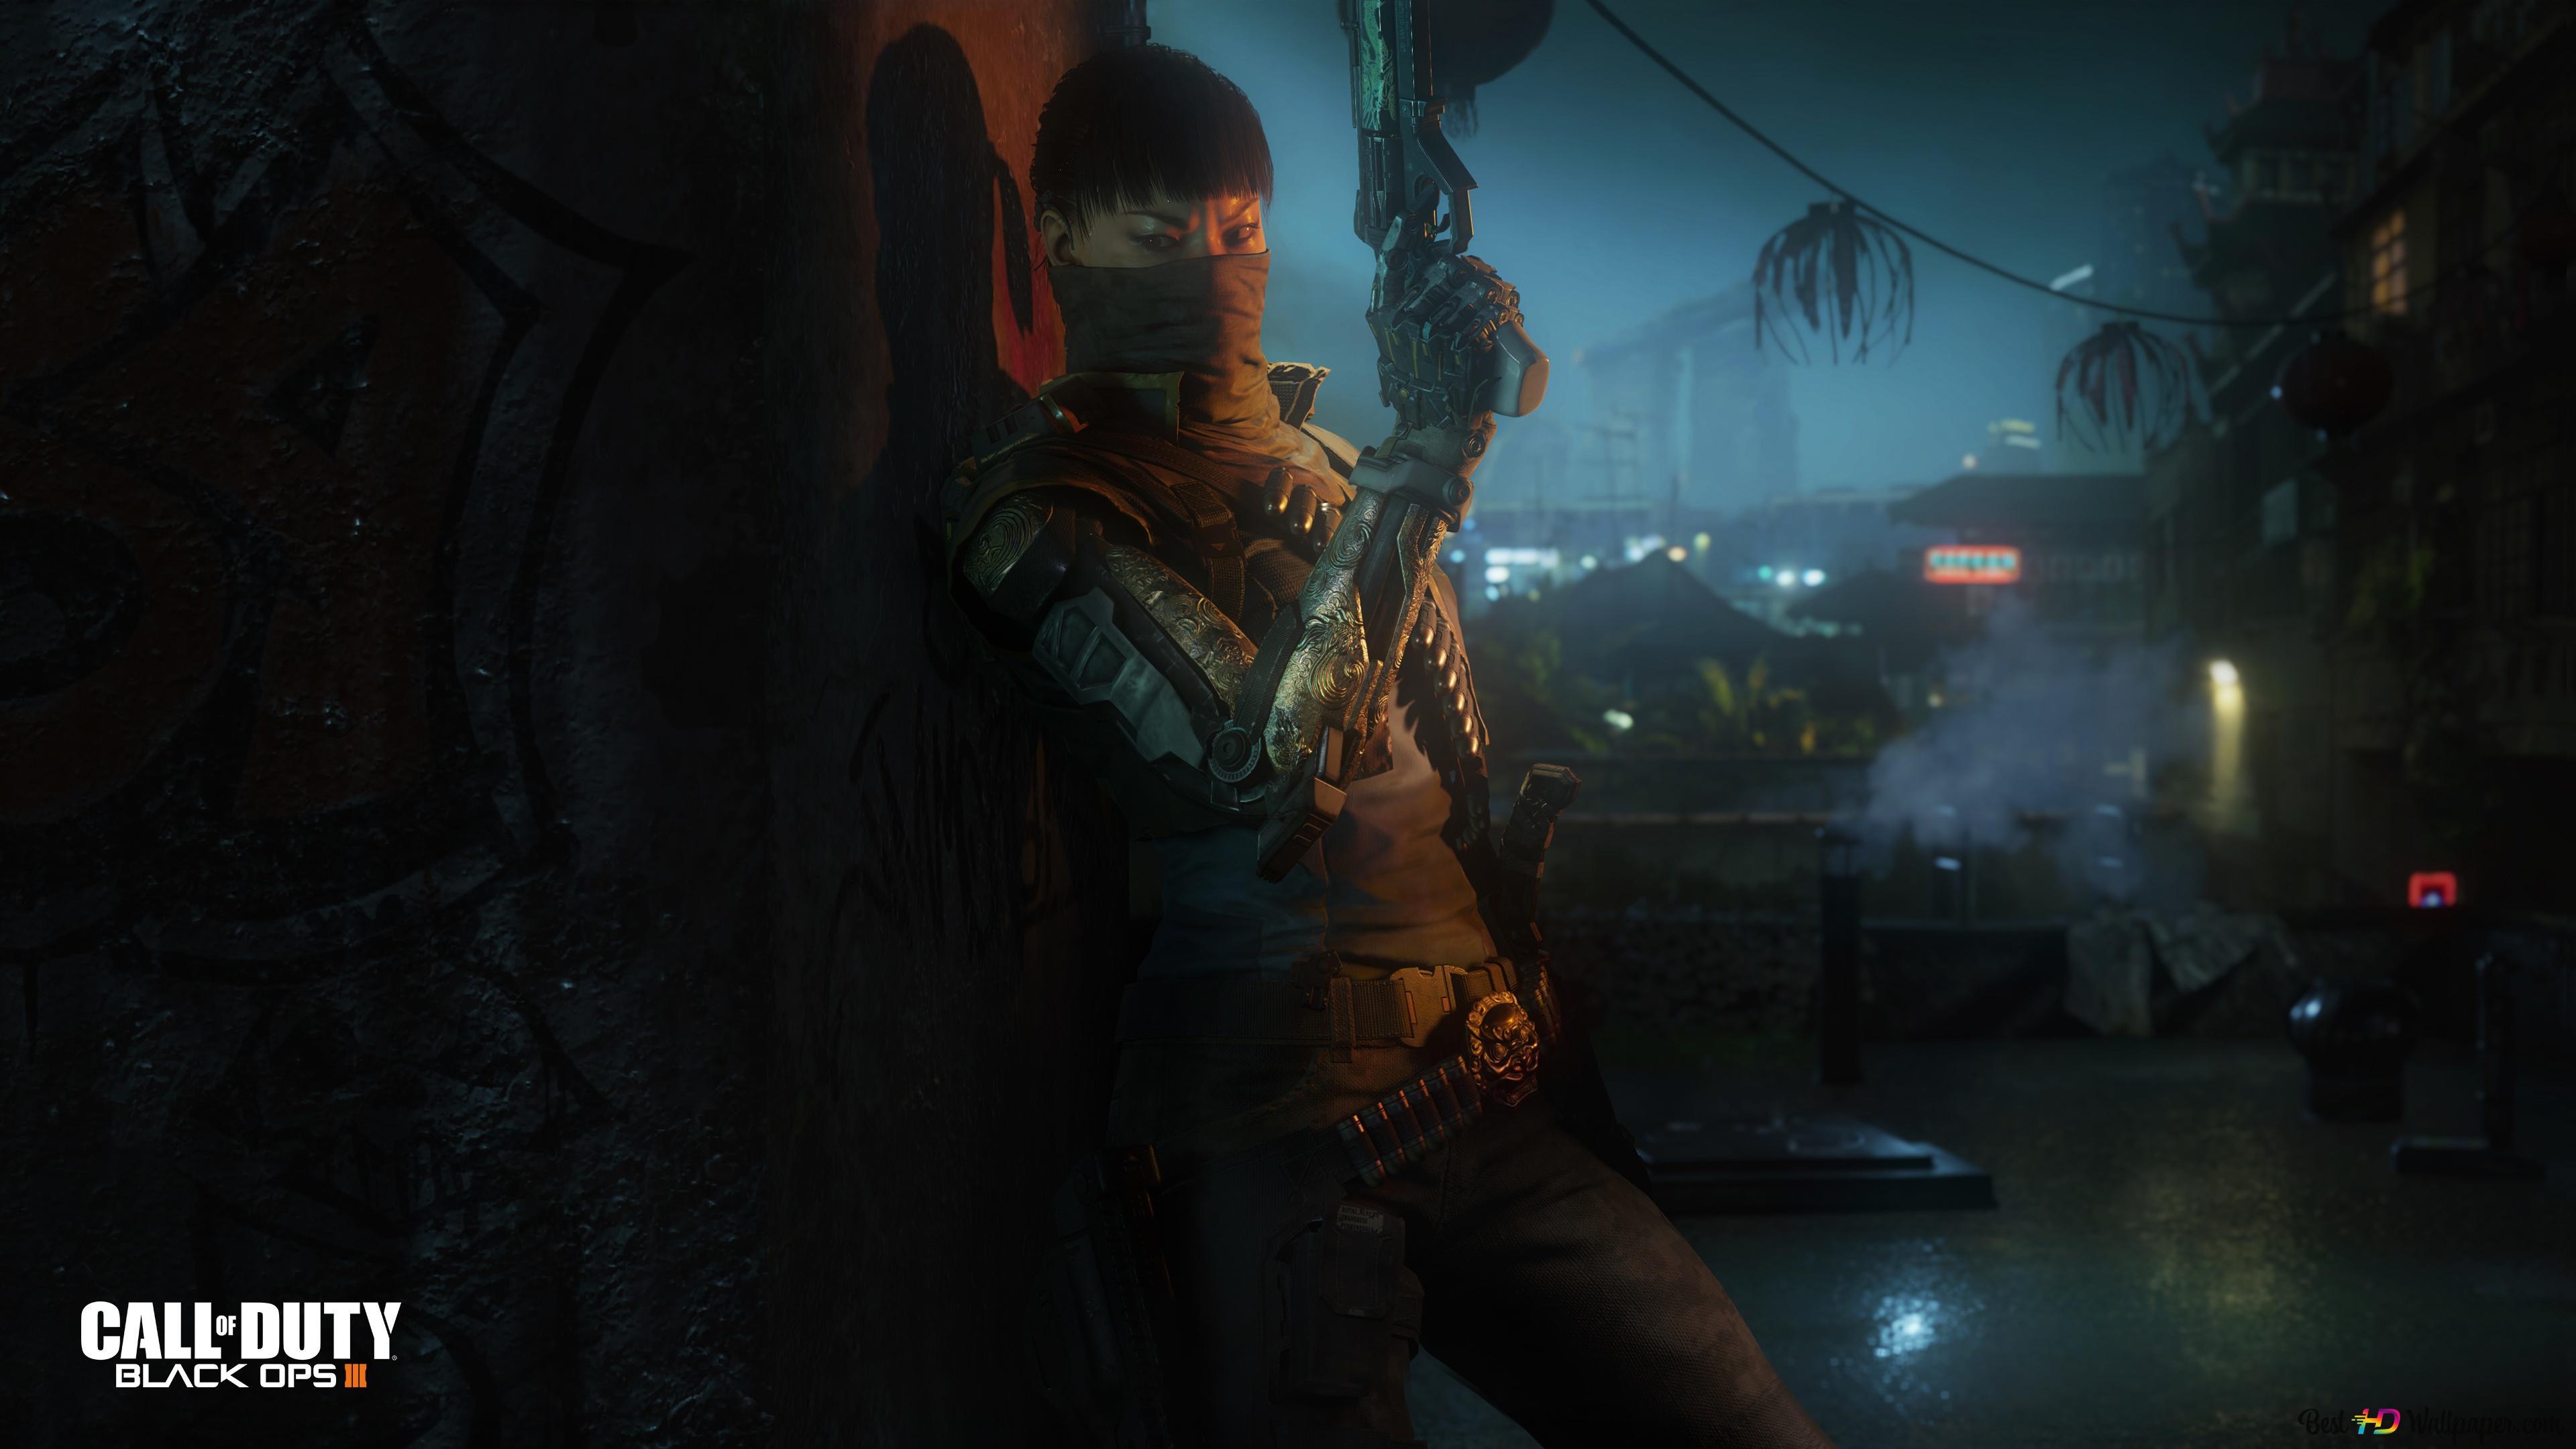 Call Of Duty Black Ops 3 Seraph Hd Wallpaper Download